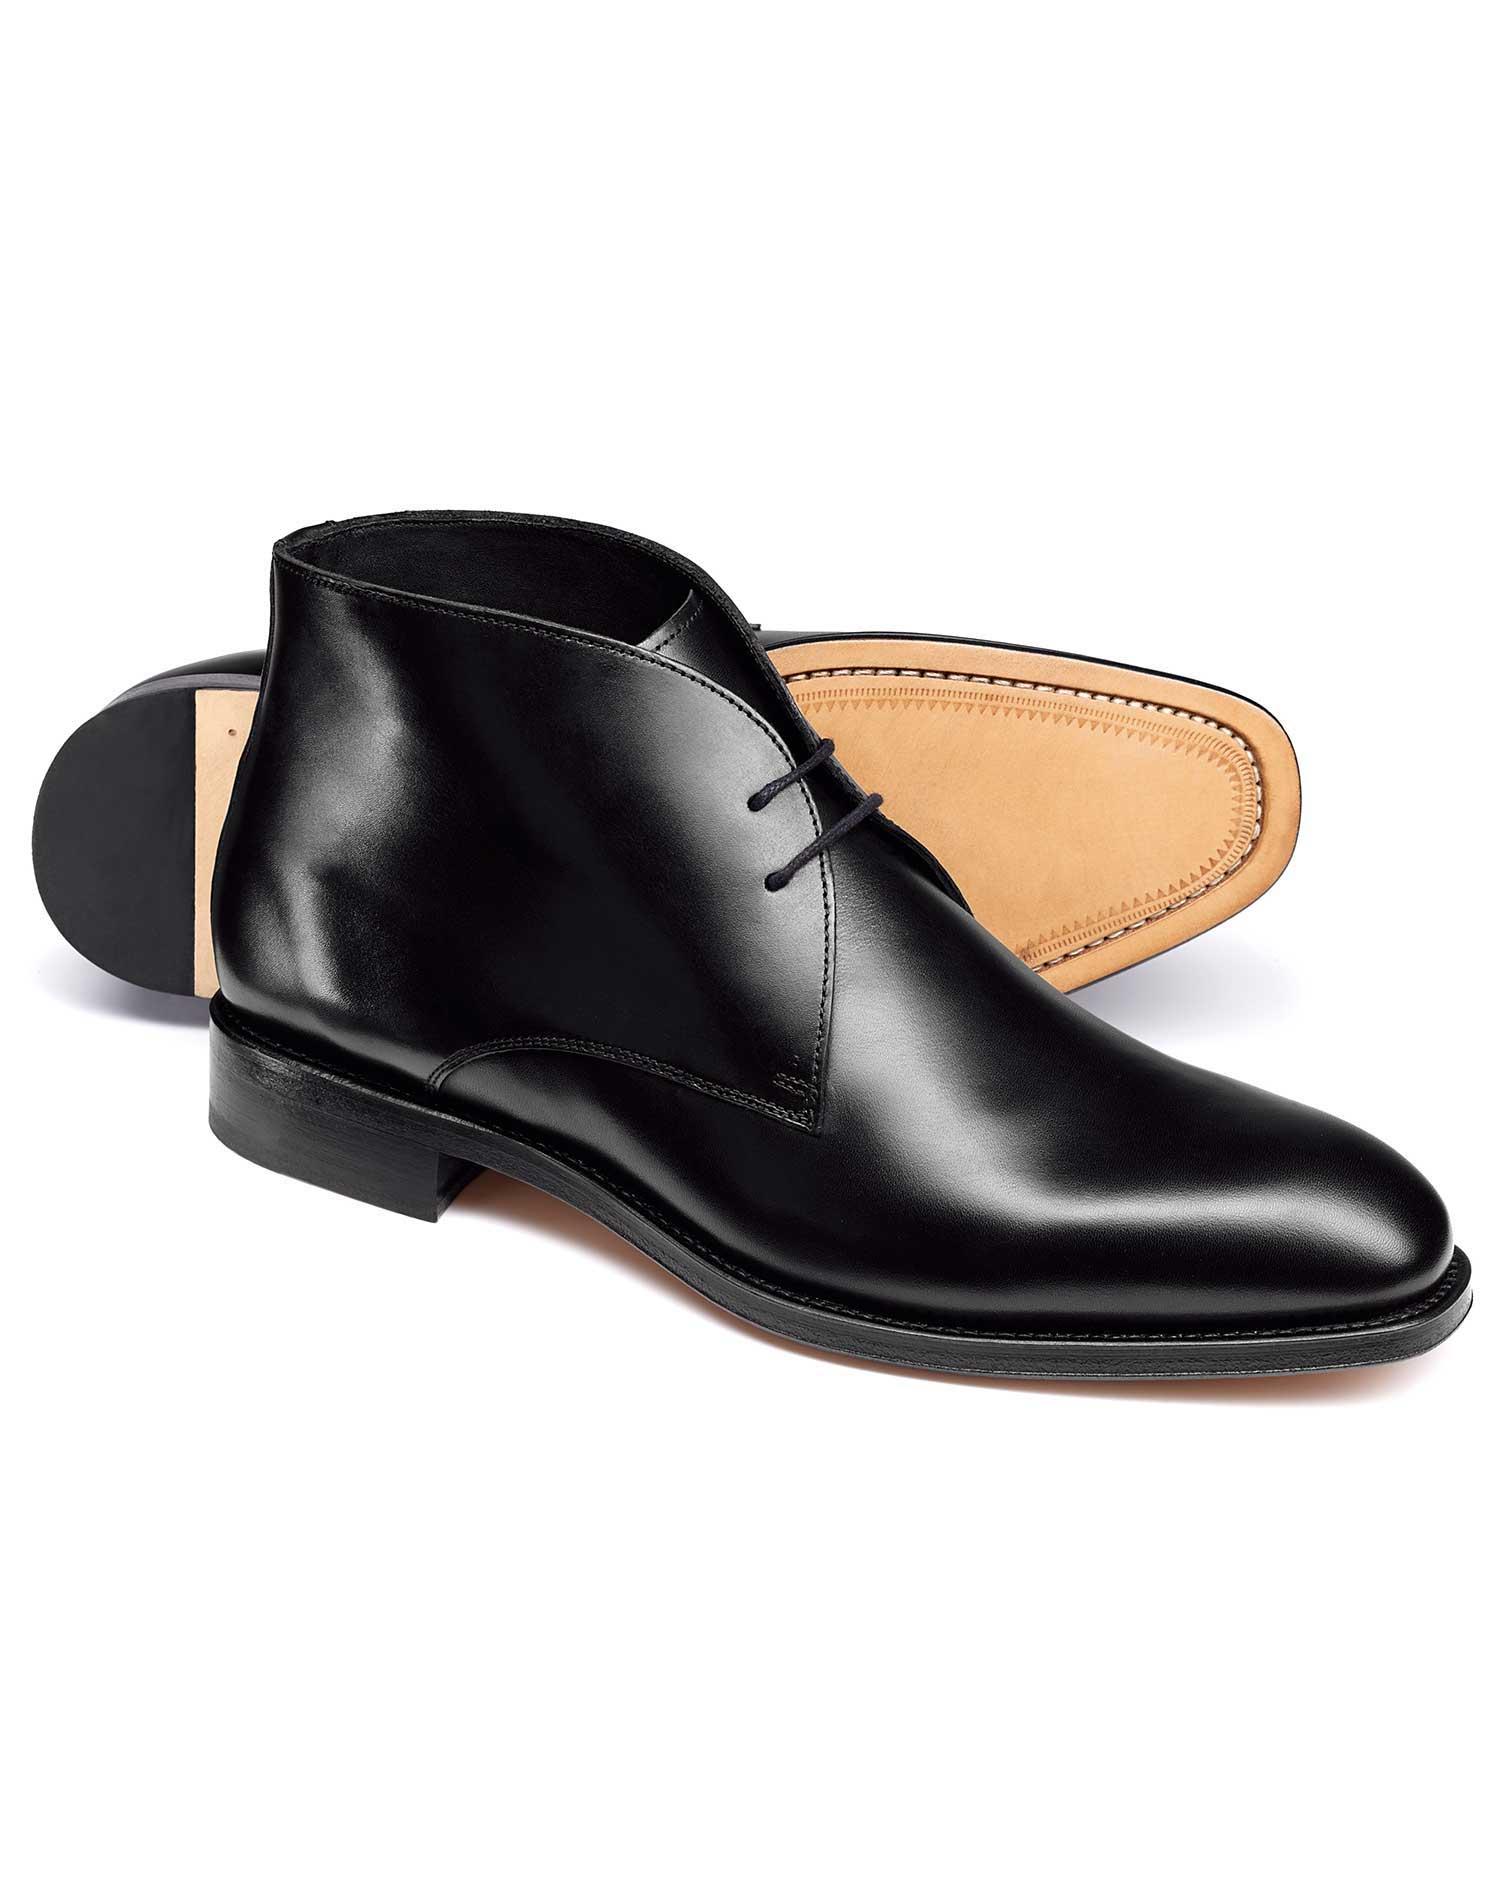 Black Chukka Boot Size 7.5 R by Charles Tyrwhitt